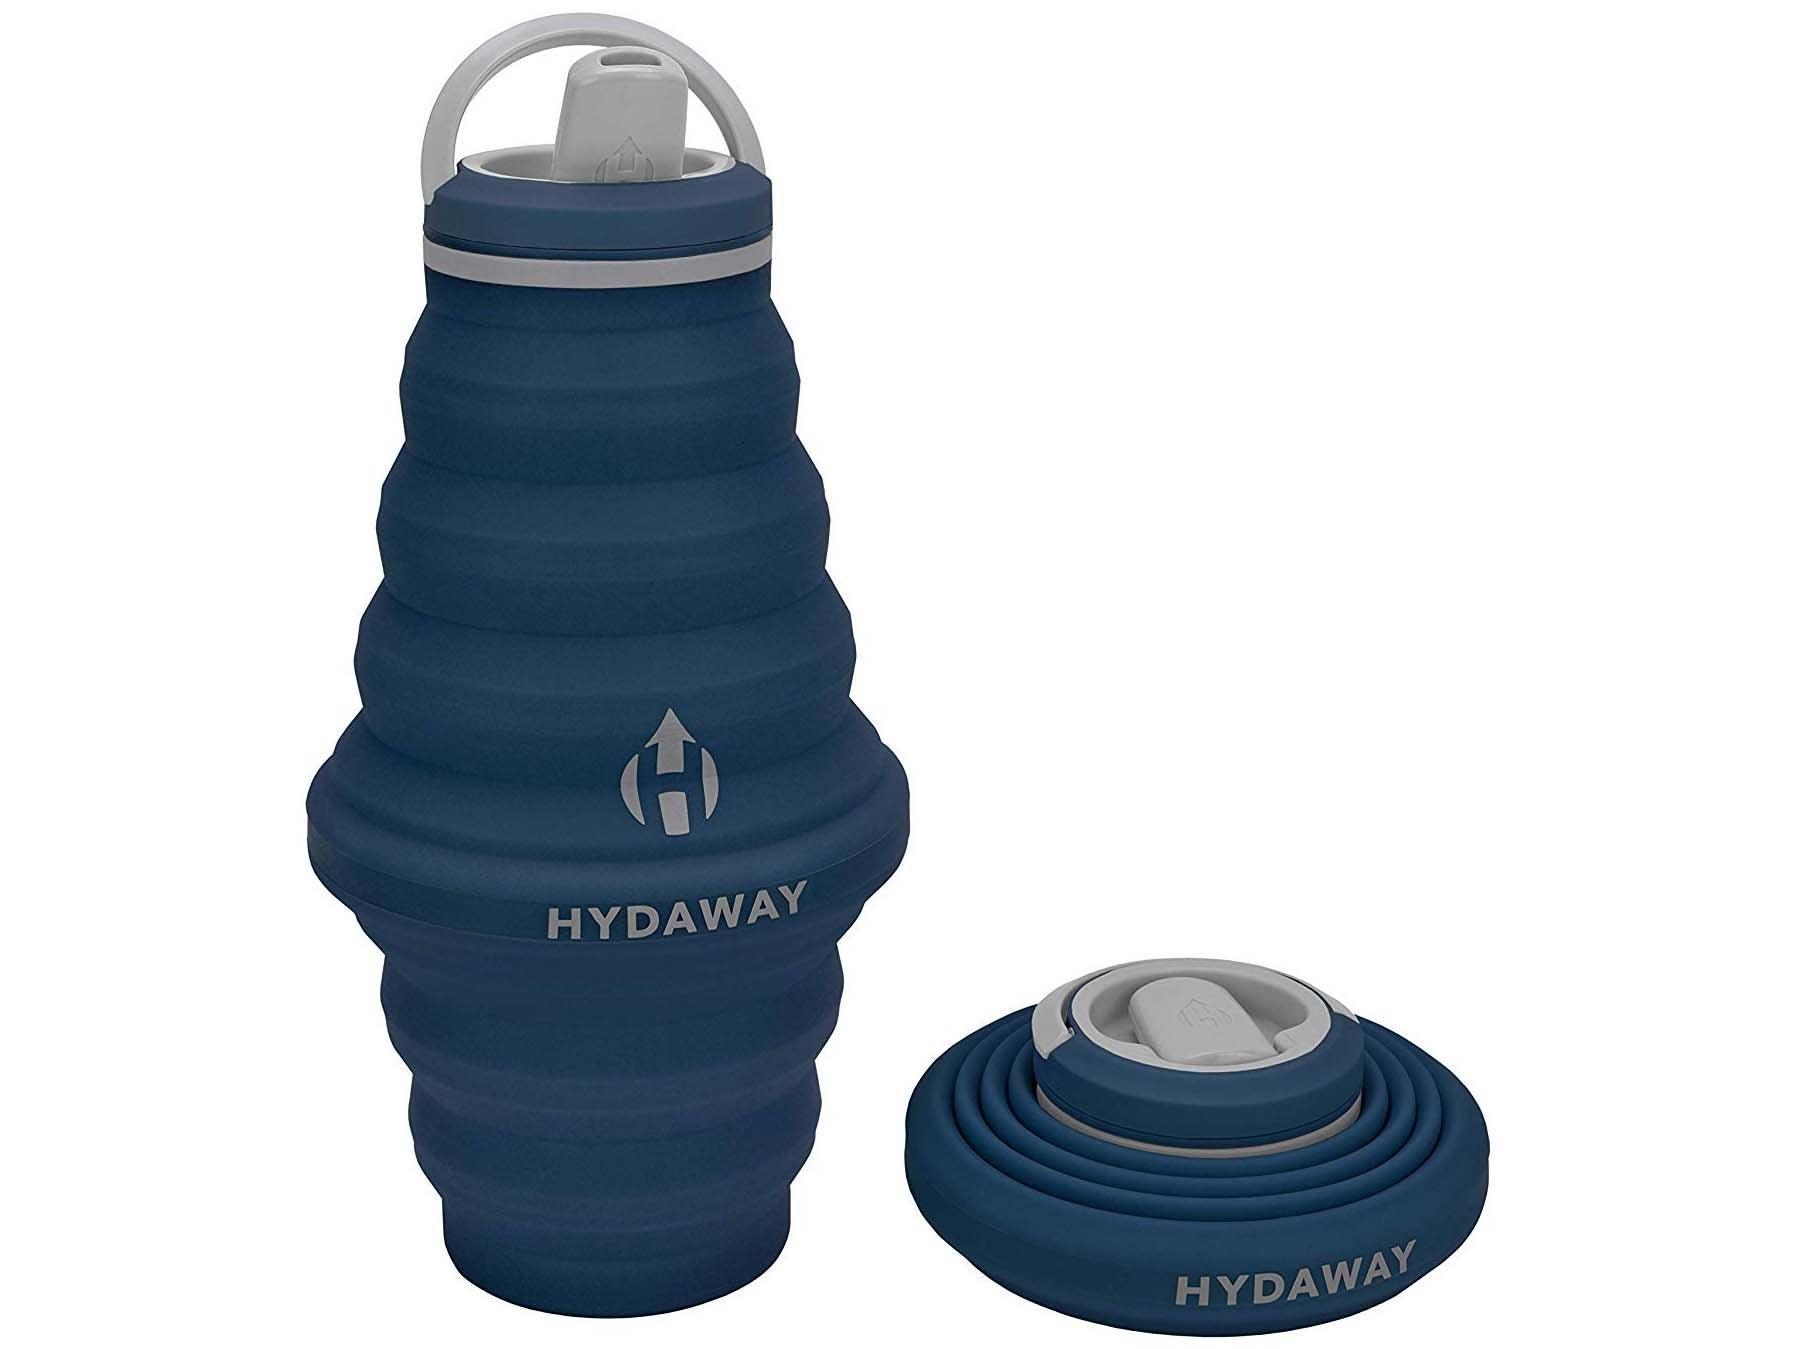 HYDAWAY Collapsible Water Bottle, 25 oz Spout Lid